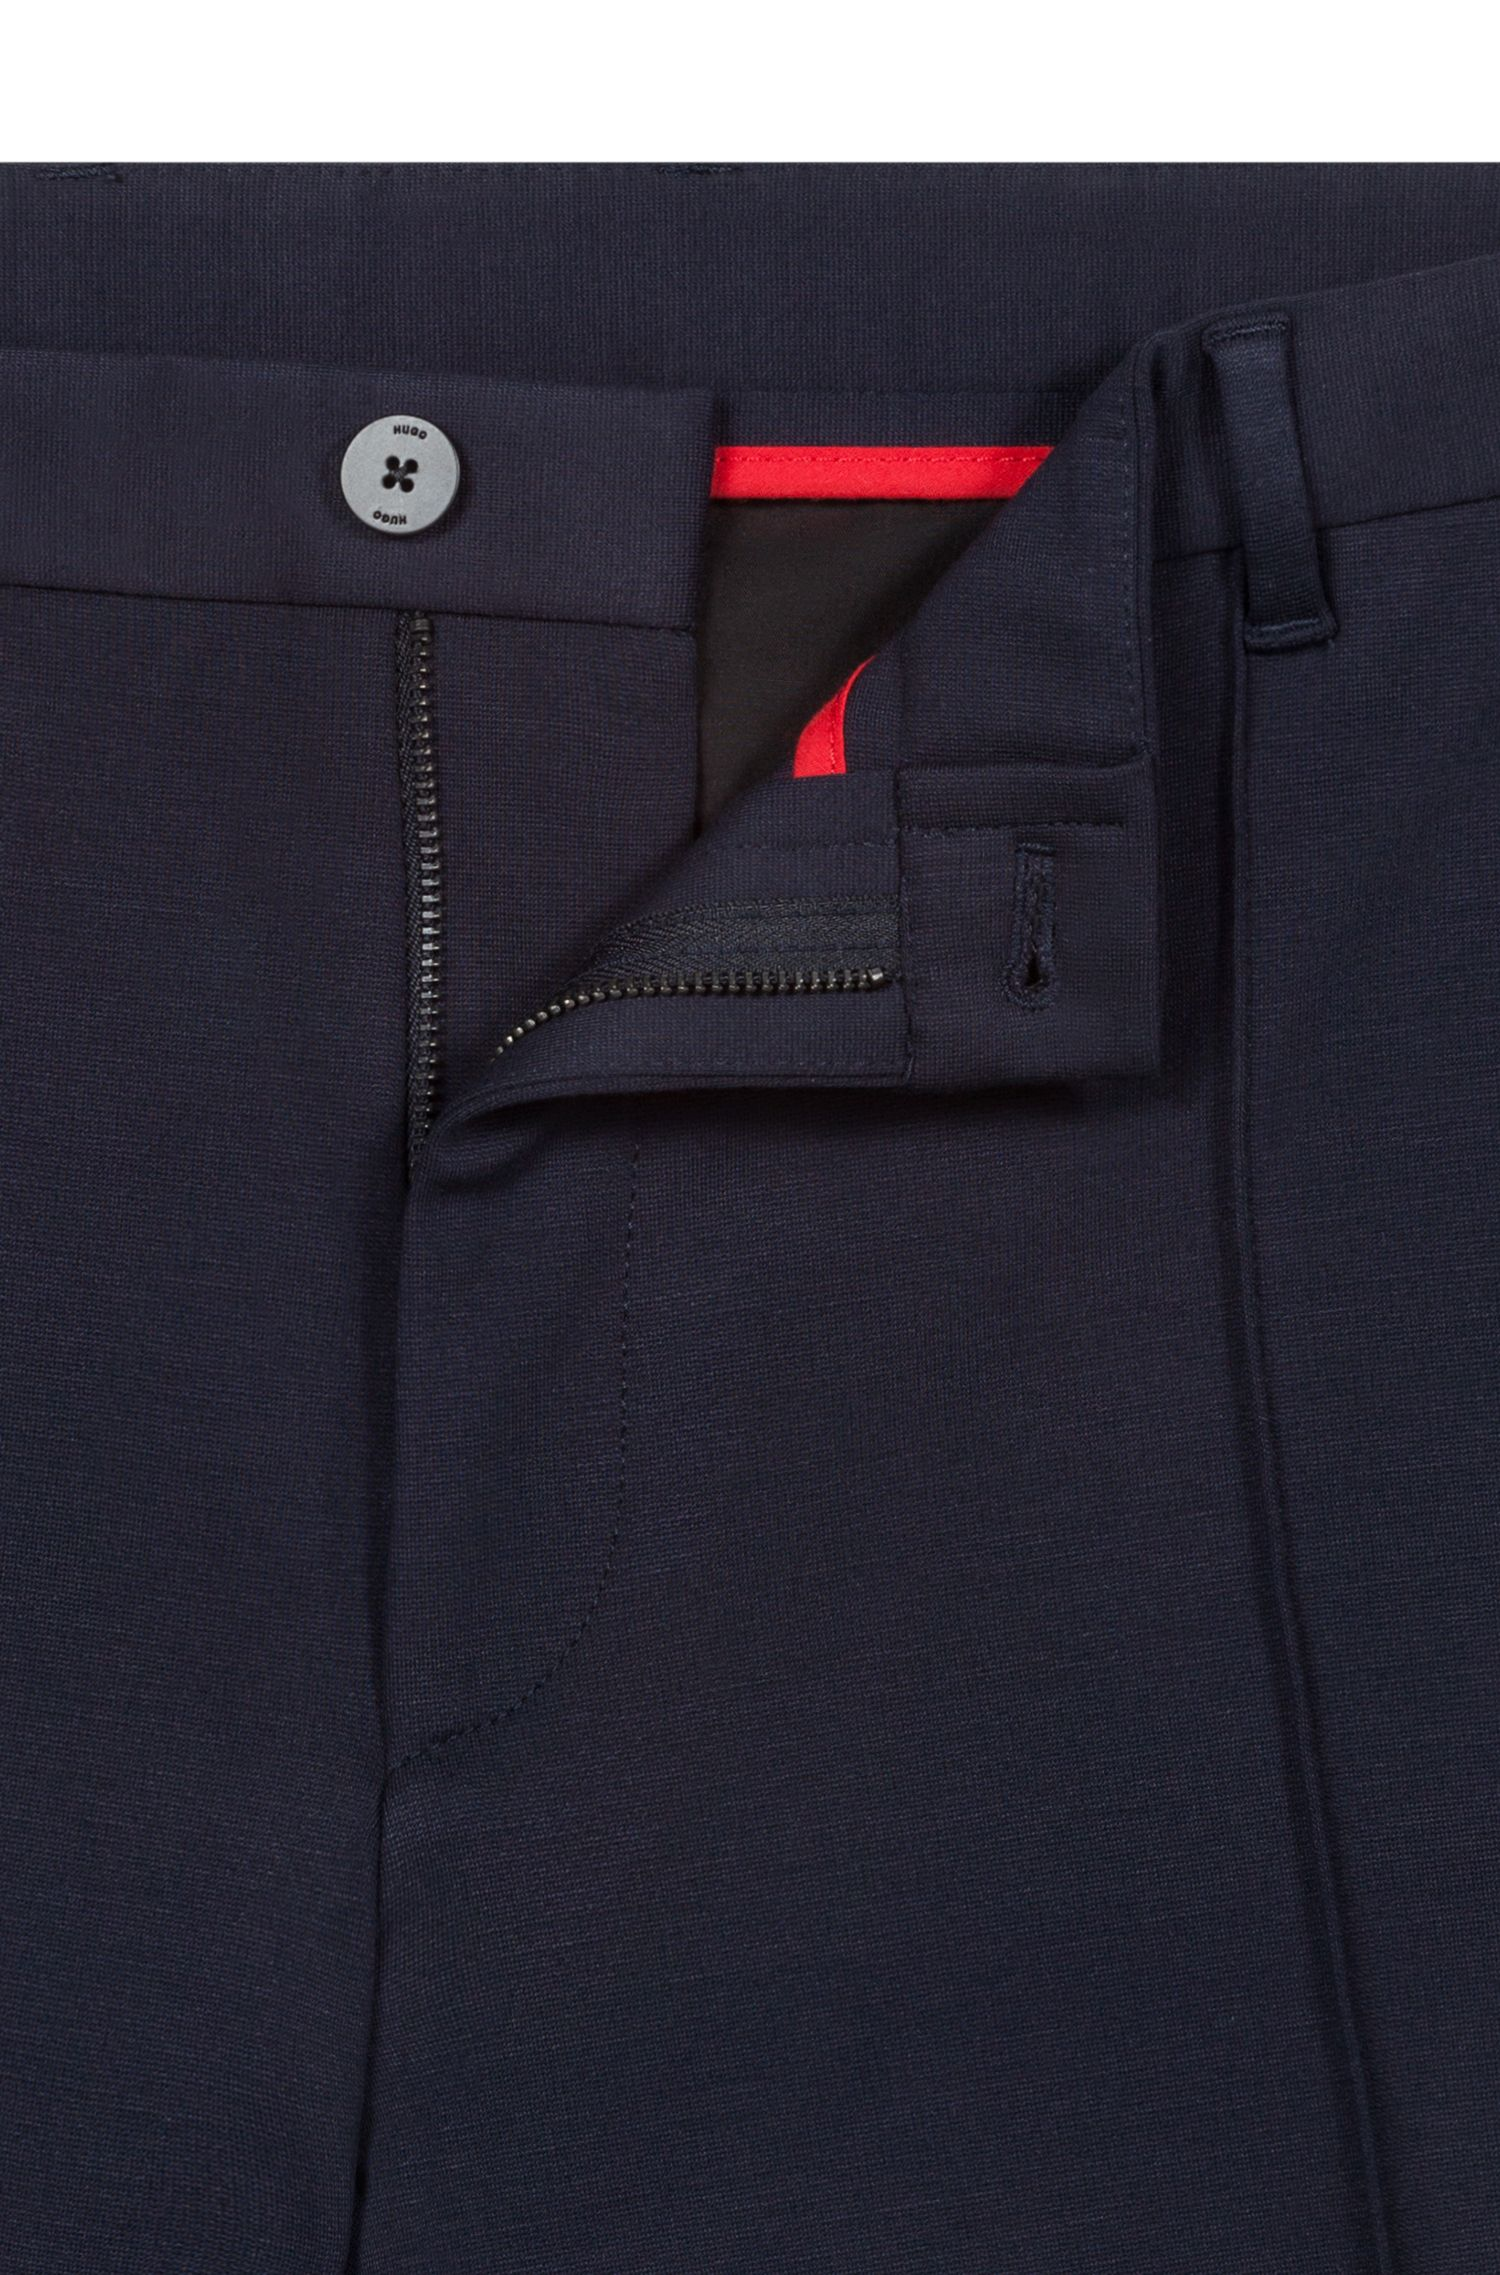 Hugo Boss - Extra-slim-fit trousers in melange jersey - 4